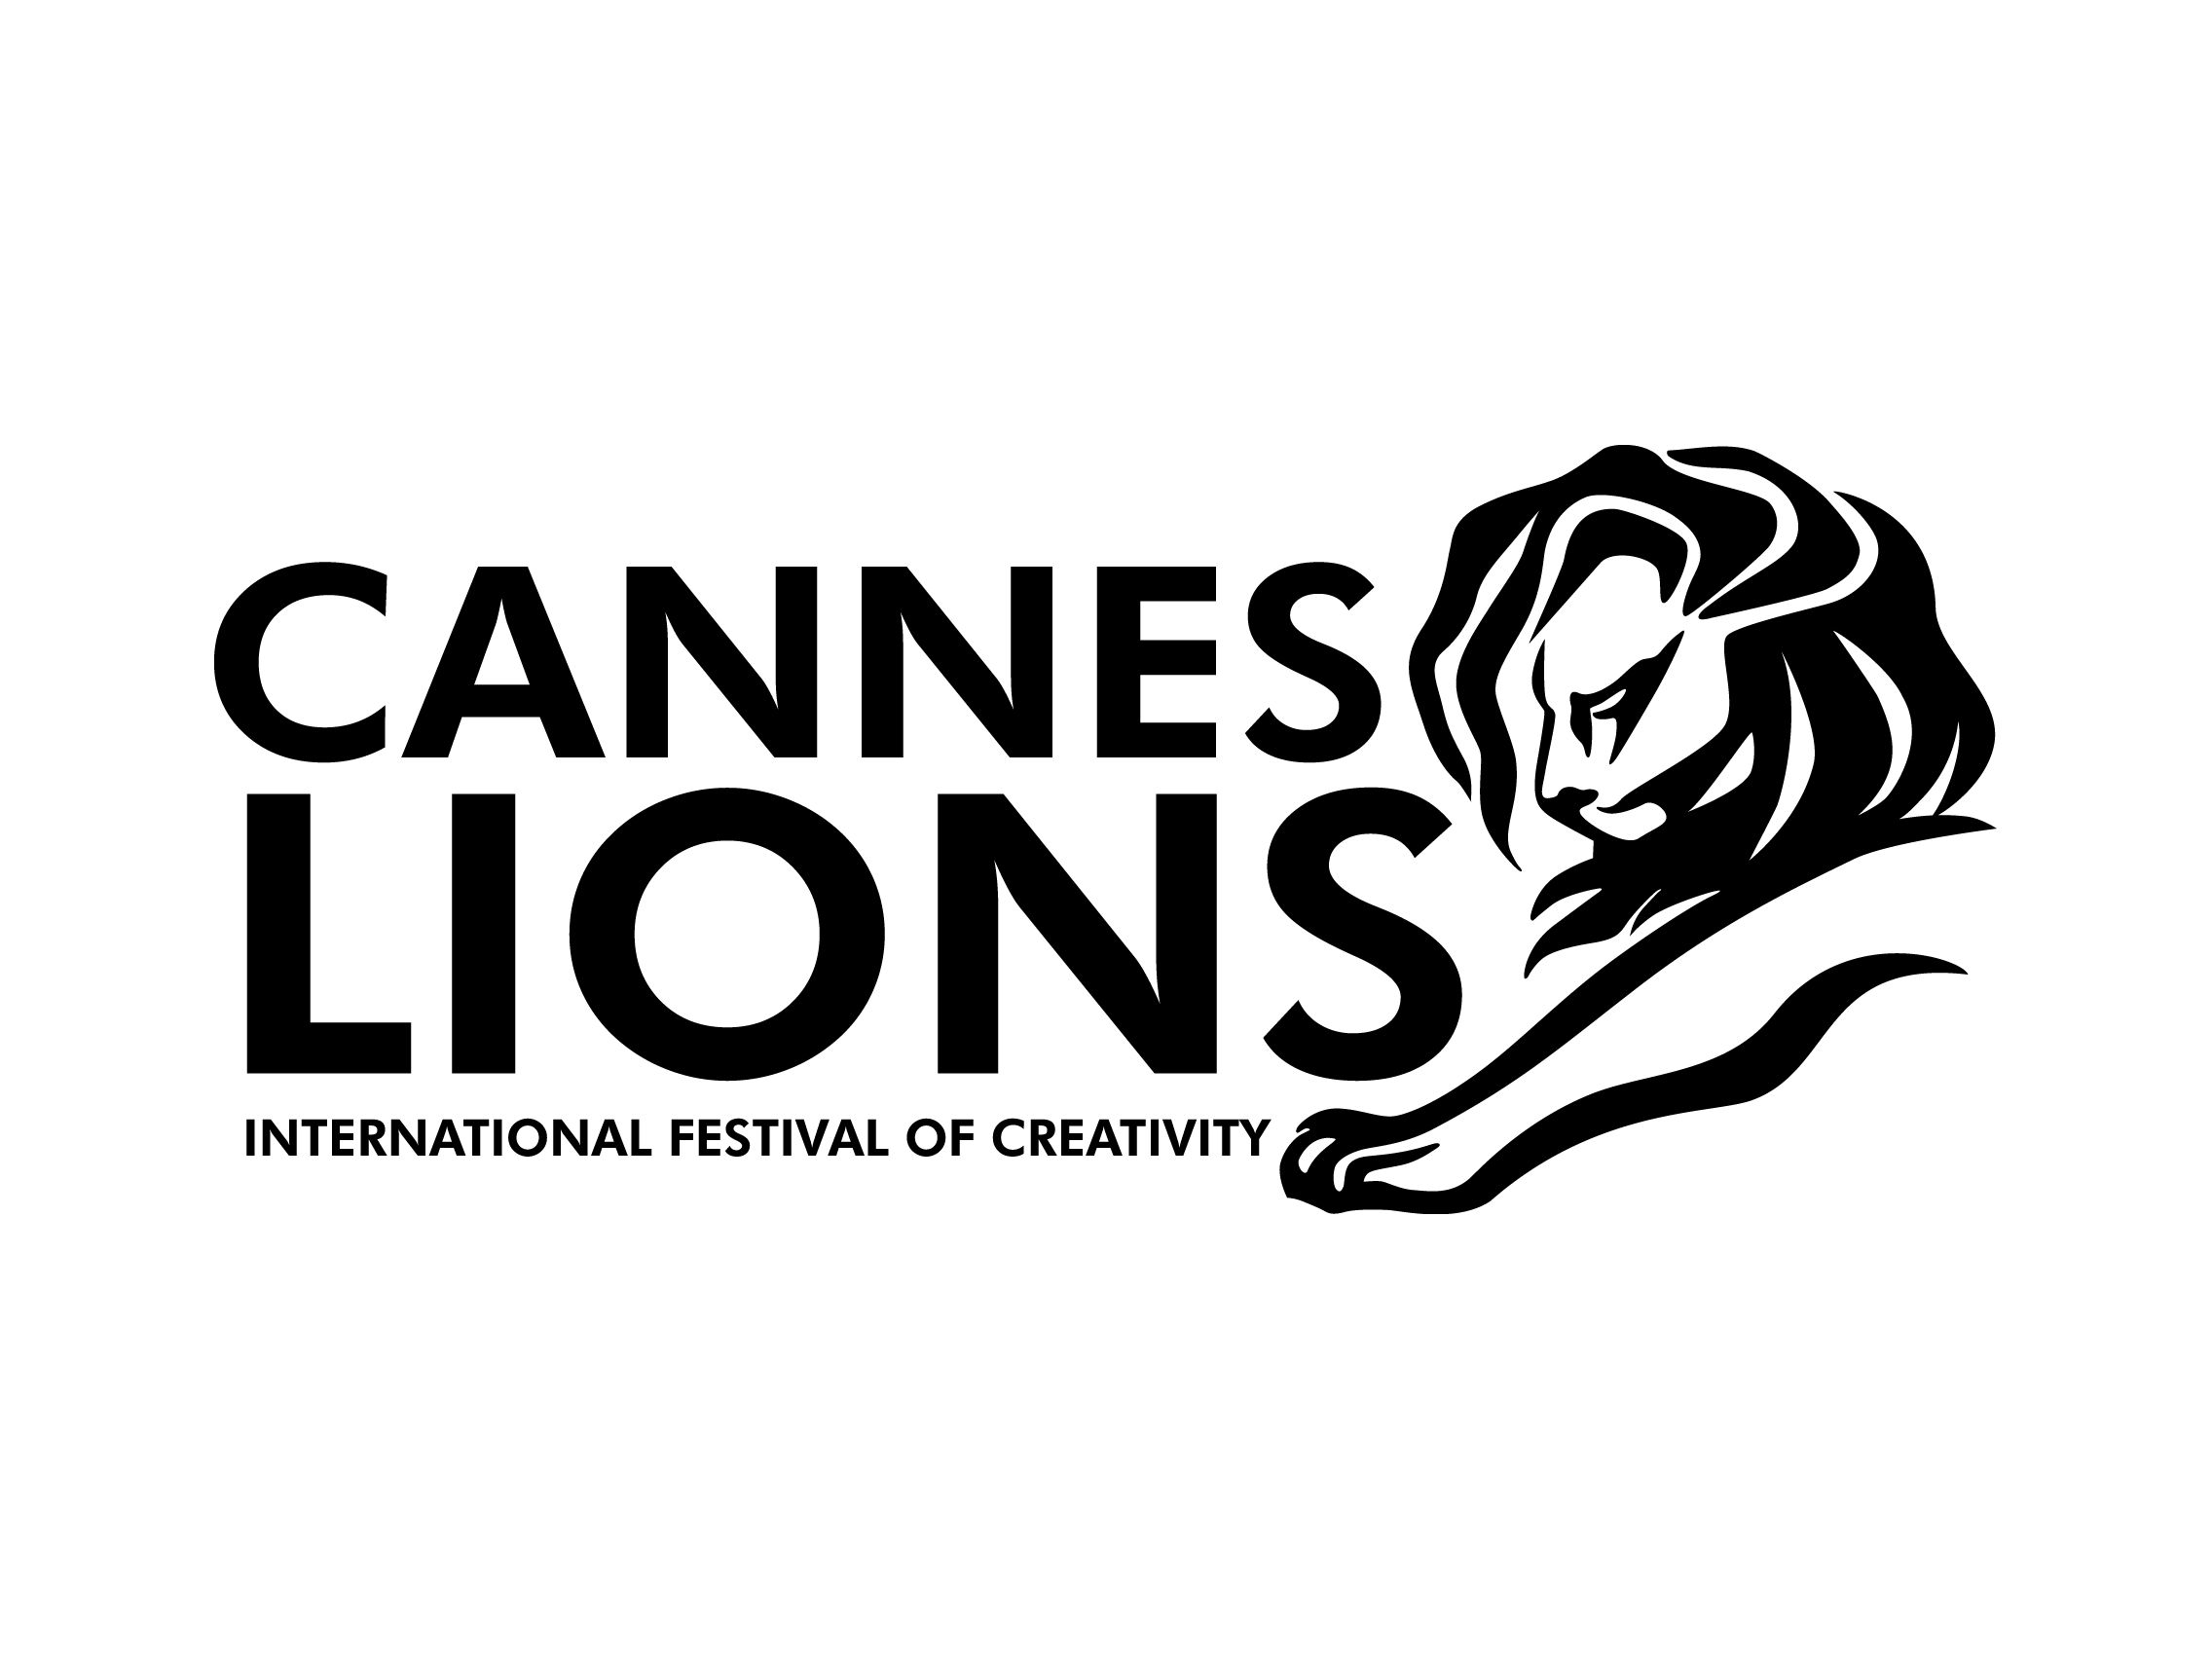 Cannes Lions logo logotype.